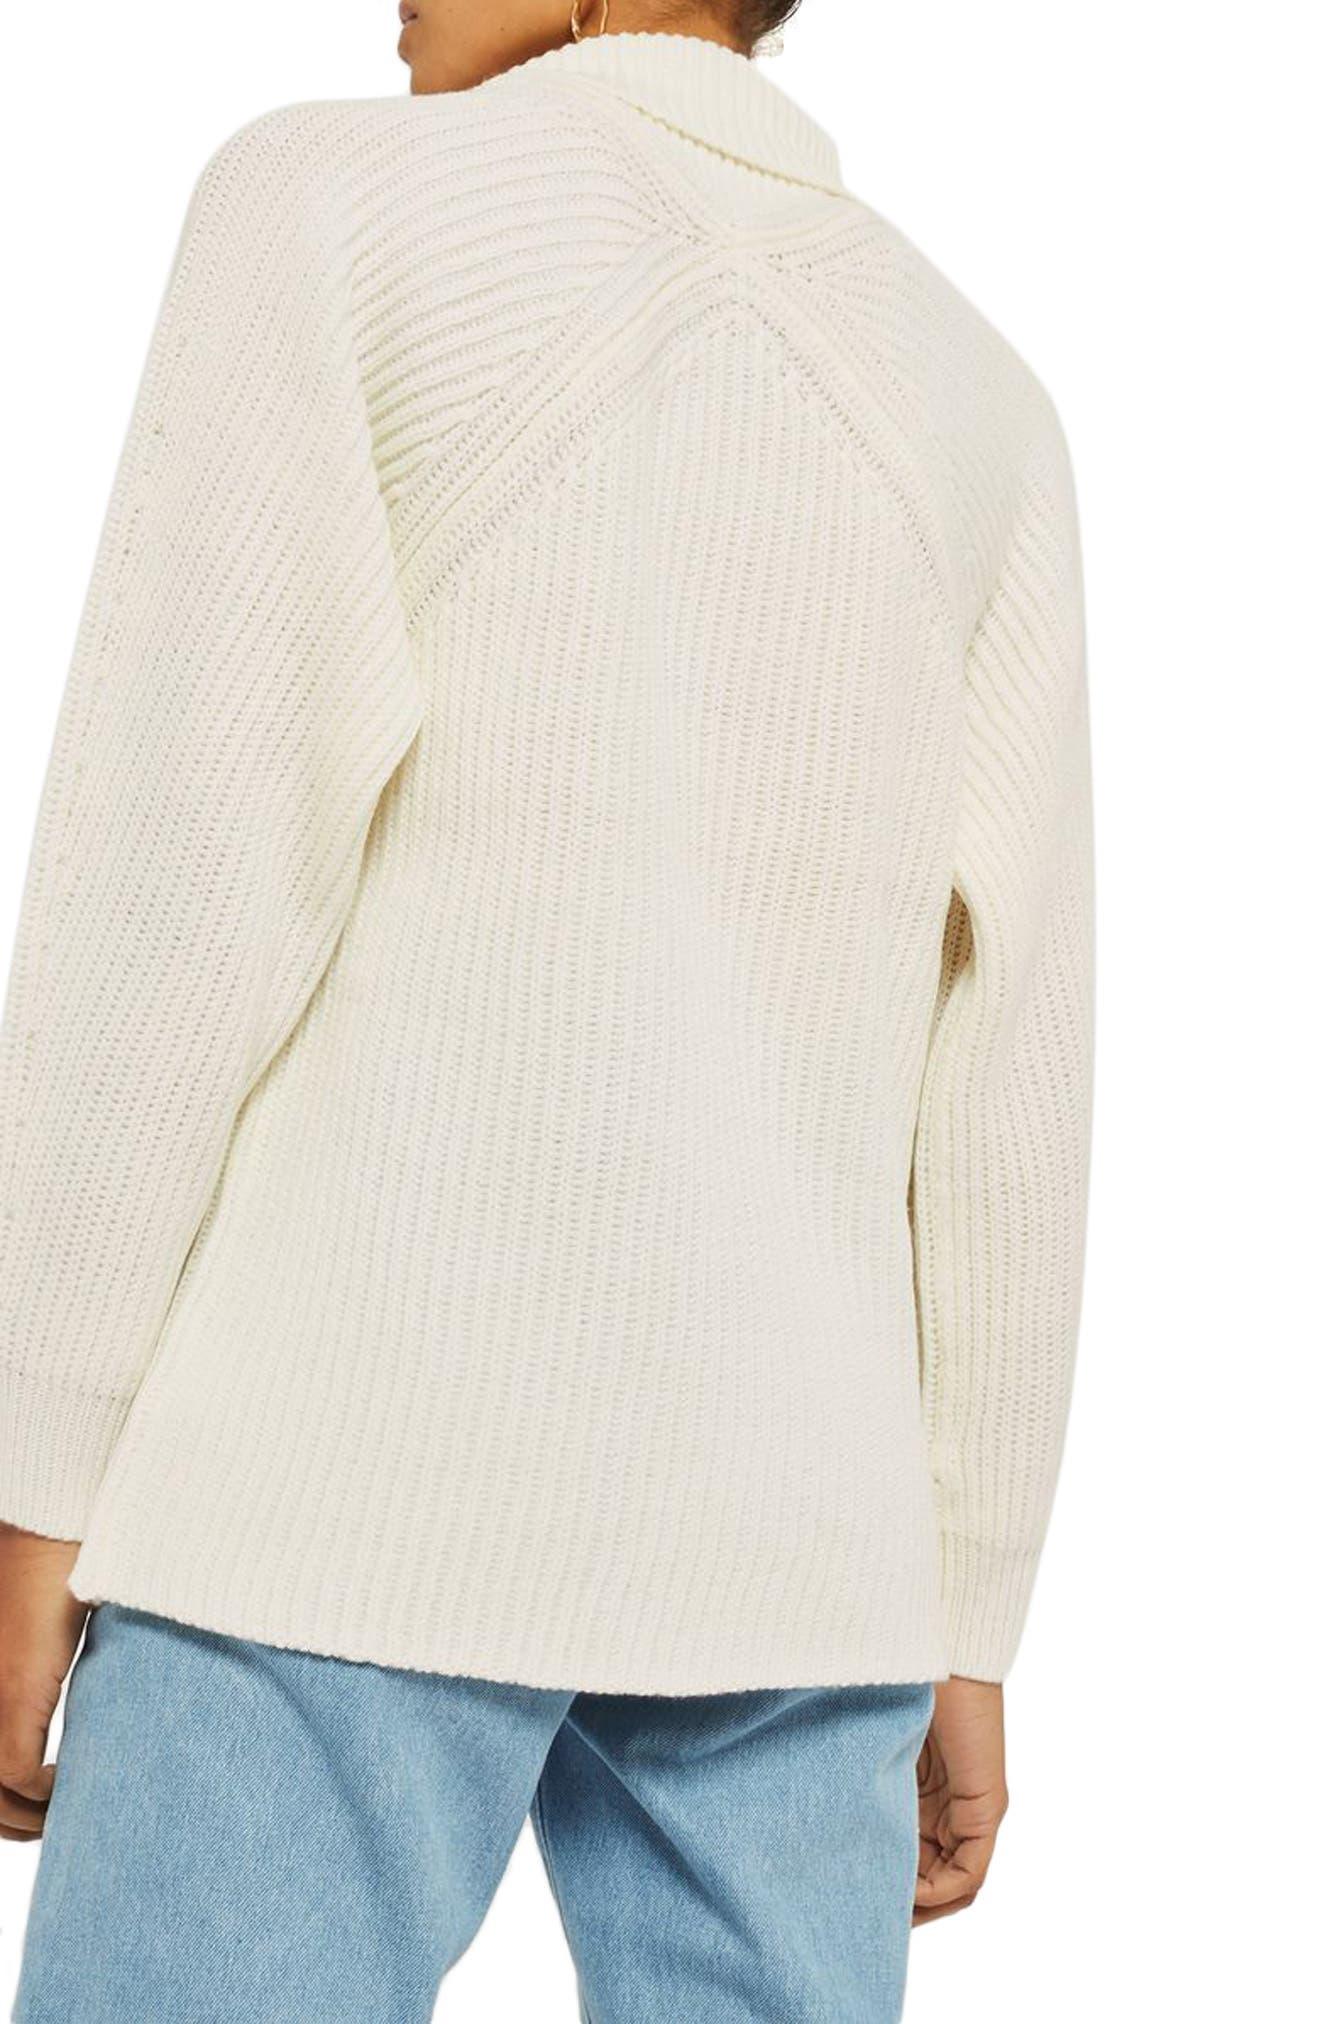 Diamond Stitch Turtleneck Sweater,                             Alternate thumbnail 2, color,                             900